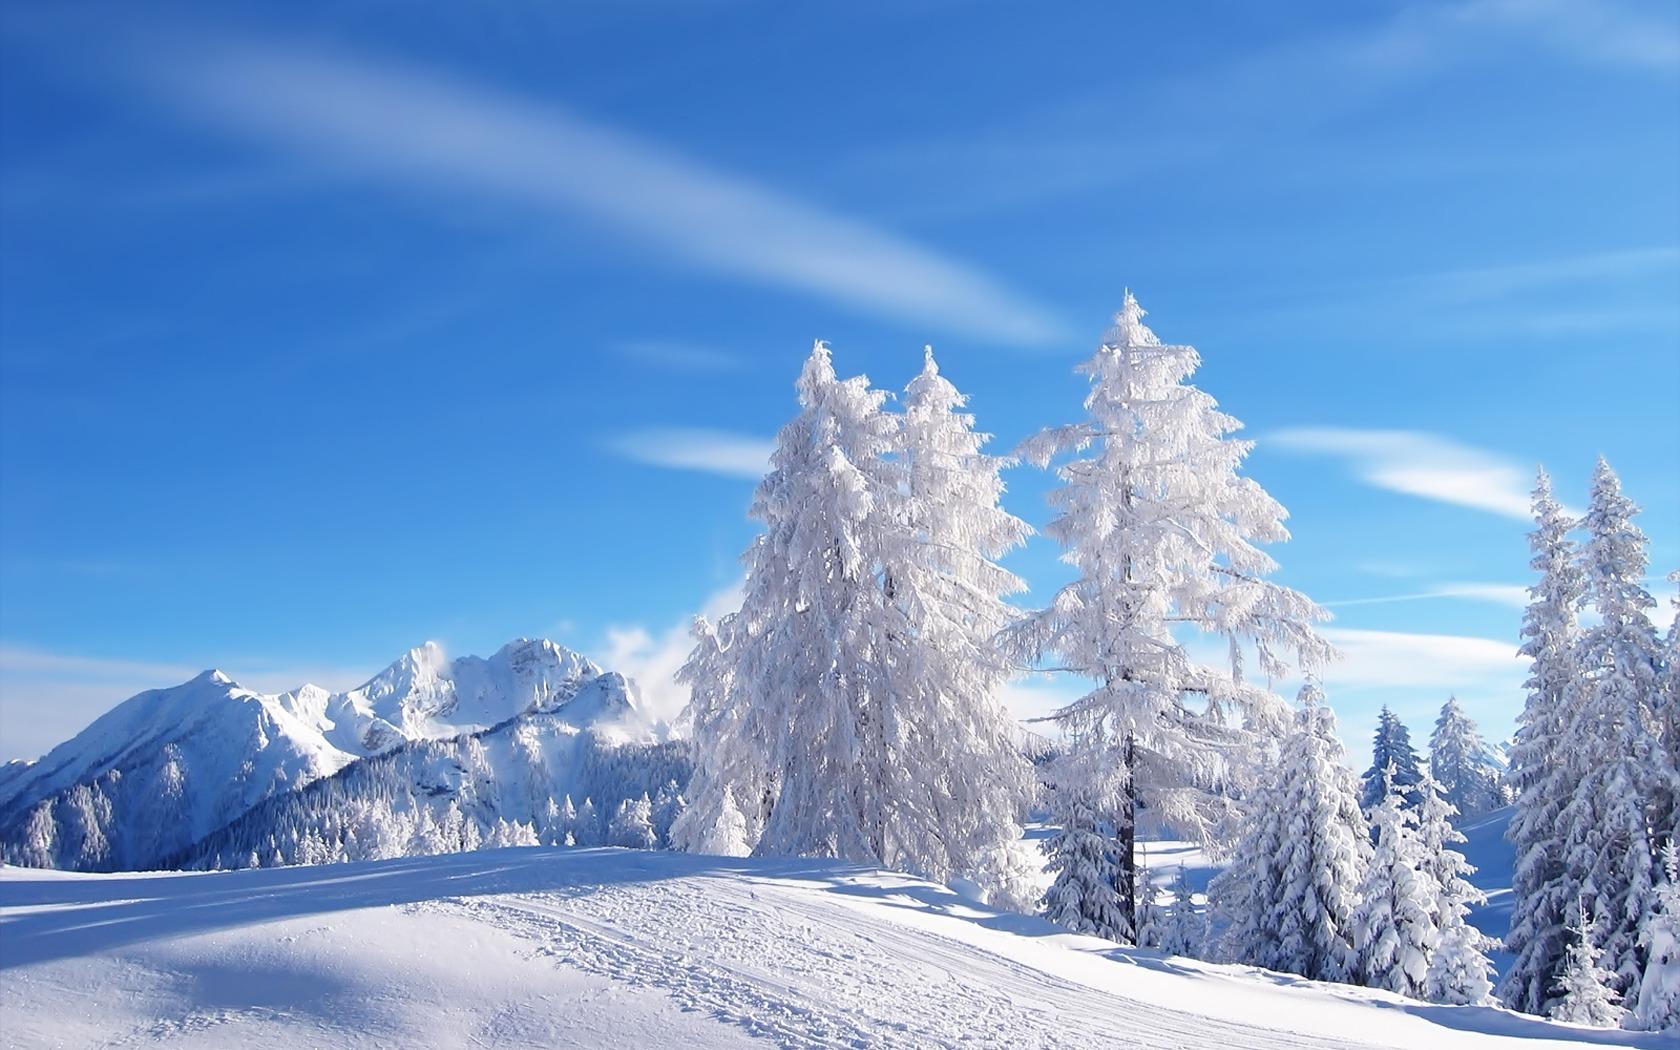 Cool Wallpaper High Resolution Snow - snow_wallpaper_winter_nature_1436  Collection_525680.jpg